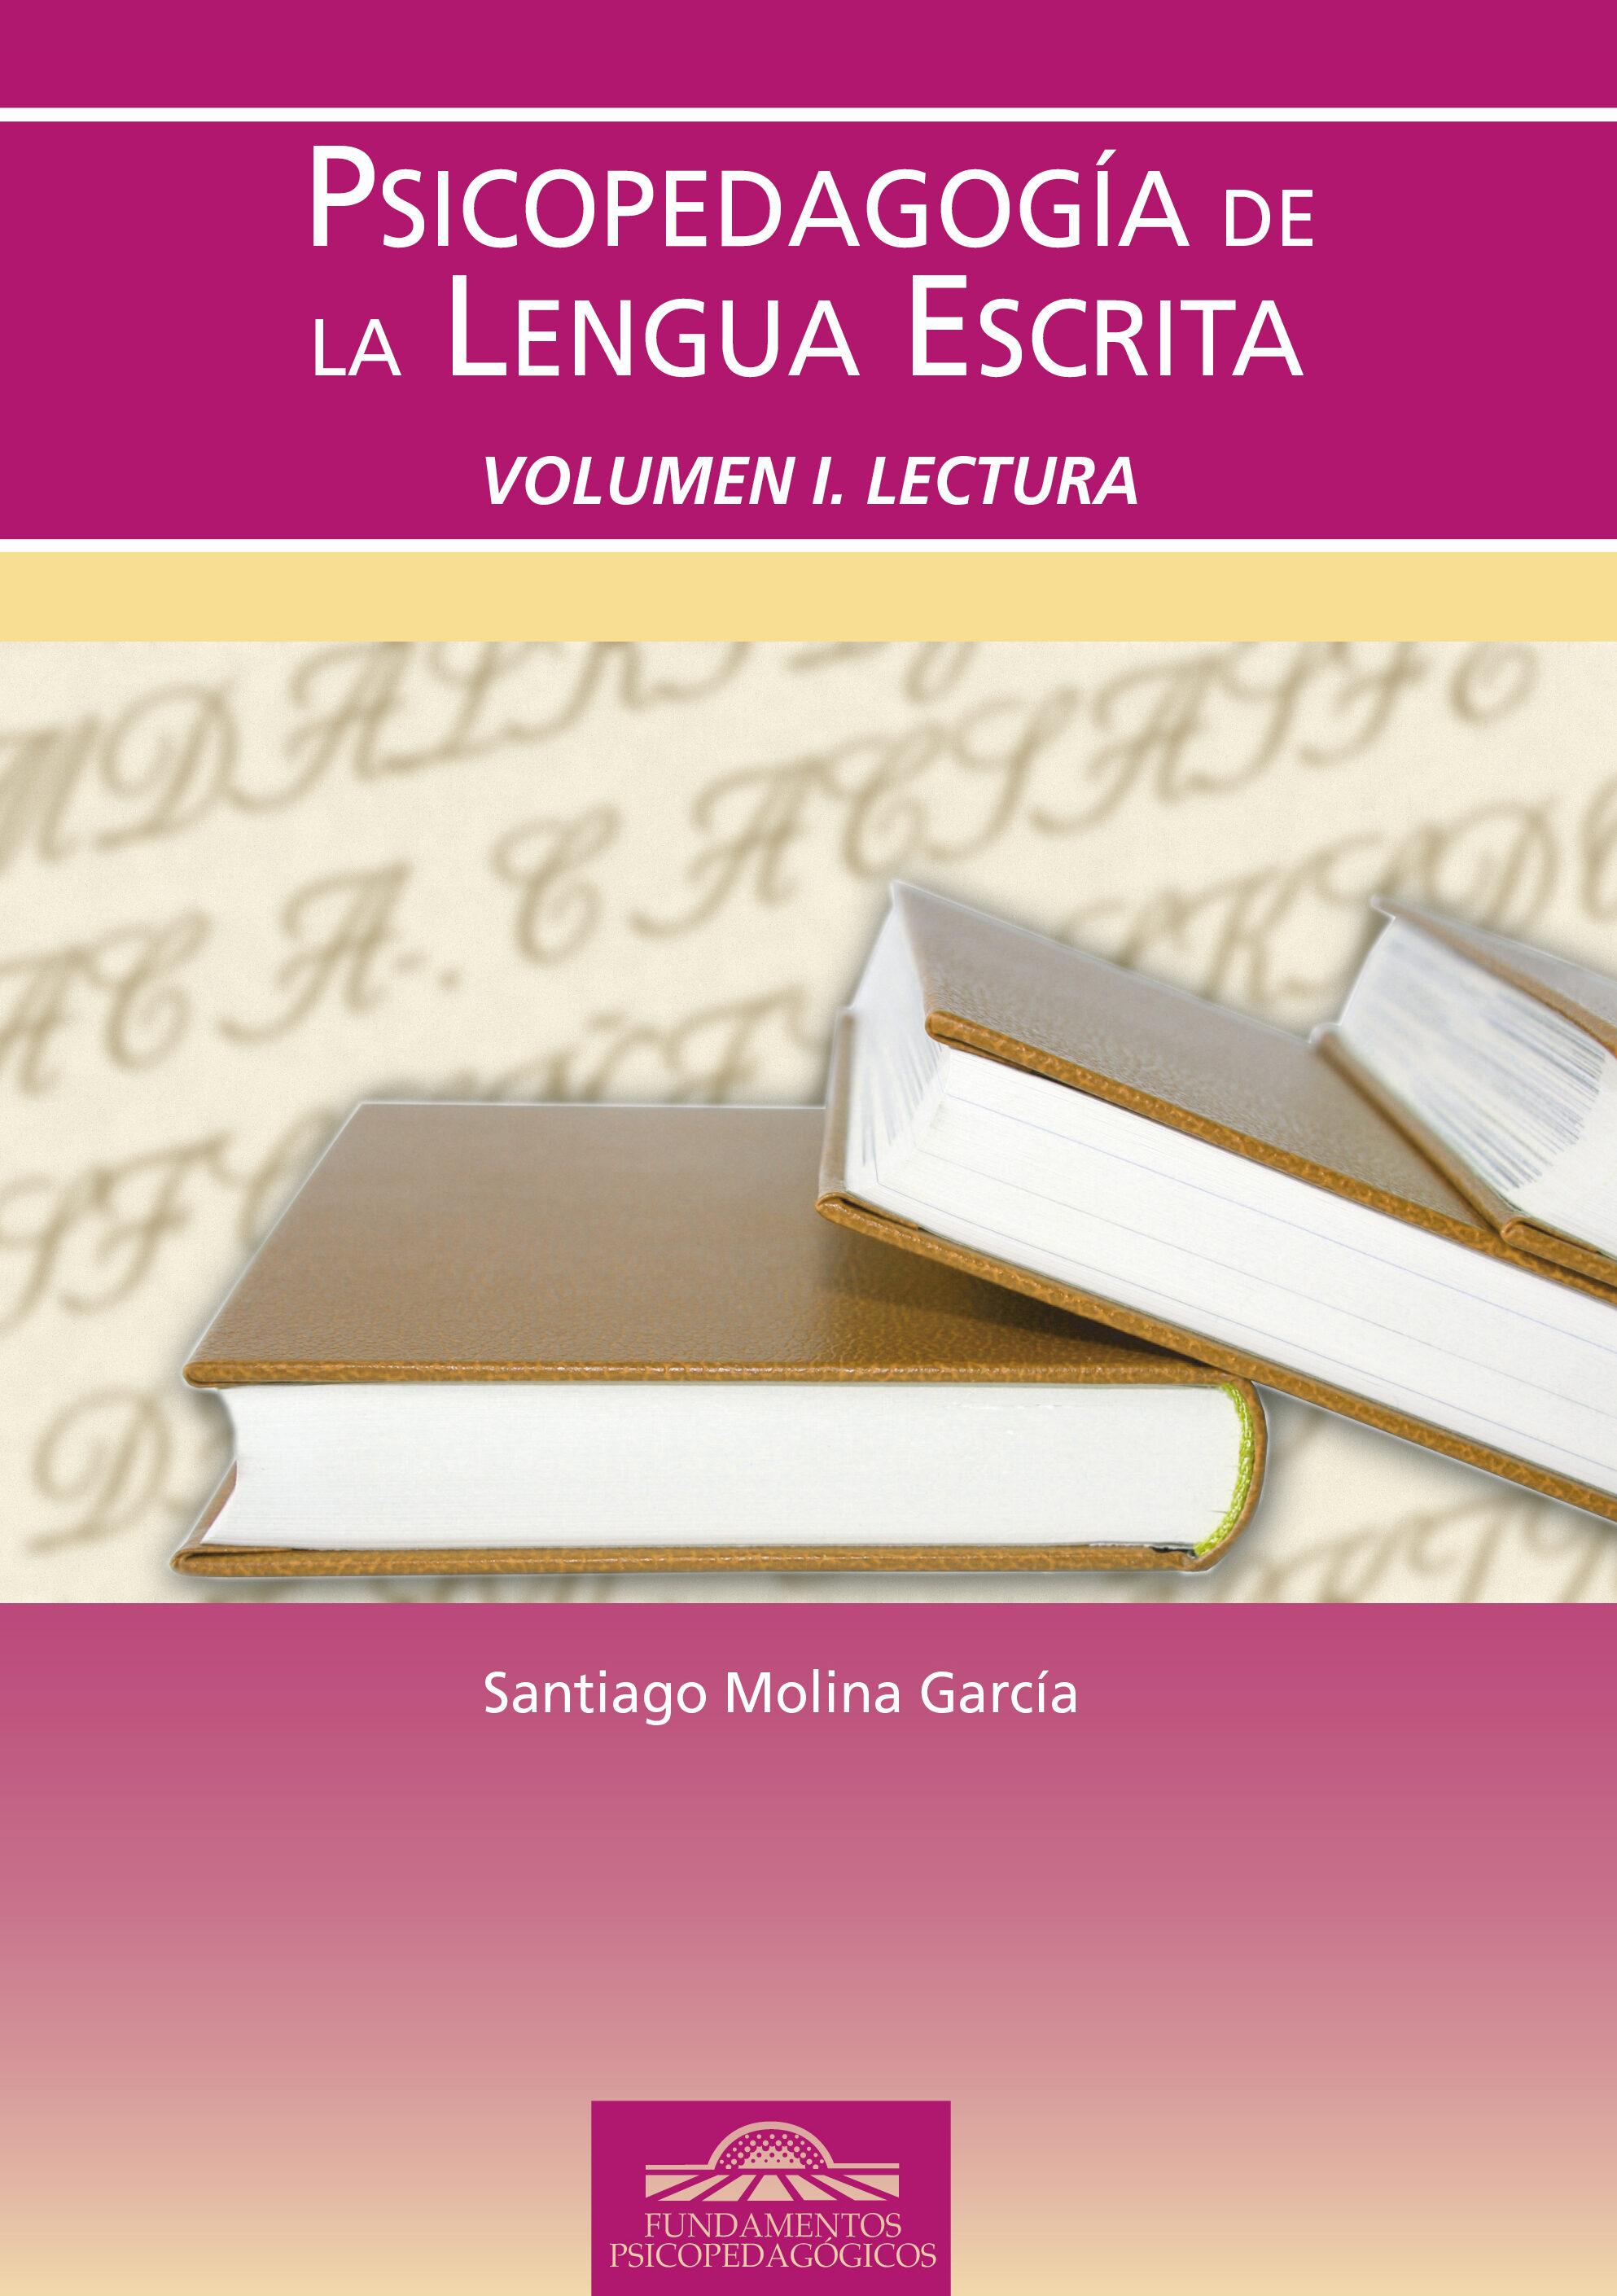 Psicopedagogia De La Lengua Escrita, Vol.1: Lectura por Santiago Molina Garcia epub